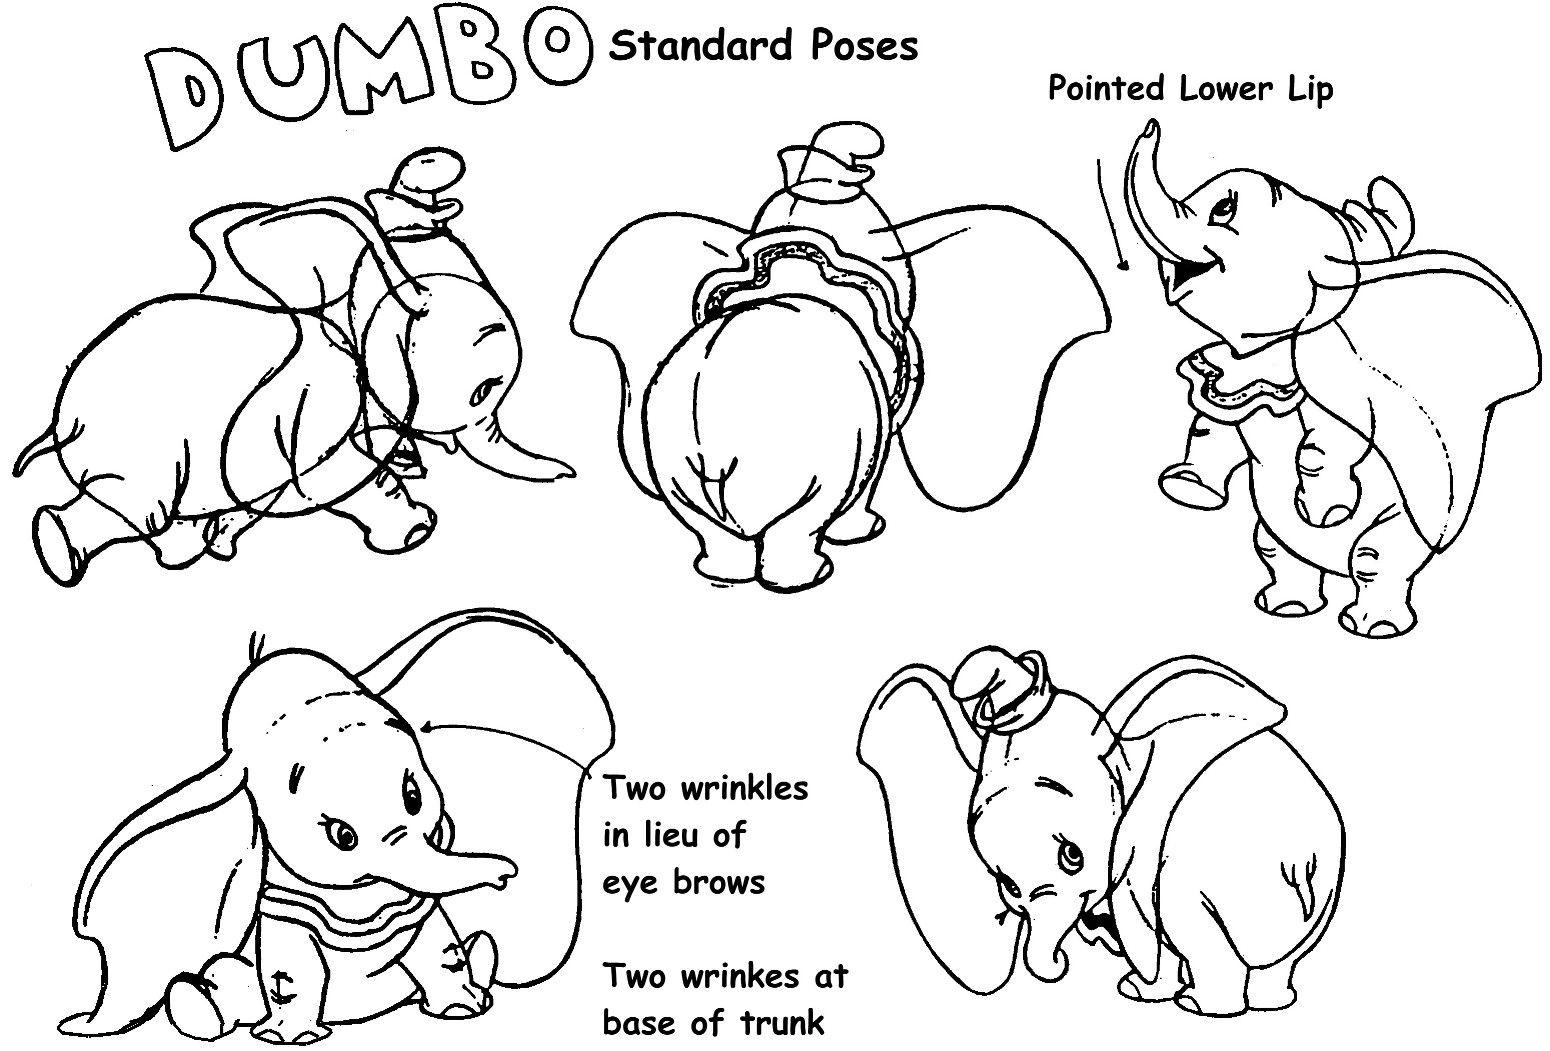 Dumbo C Walt Disney Animation Studios Blog Website Www Disneyanimation Com Online Store Www Disneyst Dessins Disney Livre Coloriage Coloriage